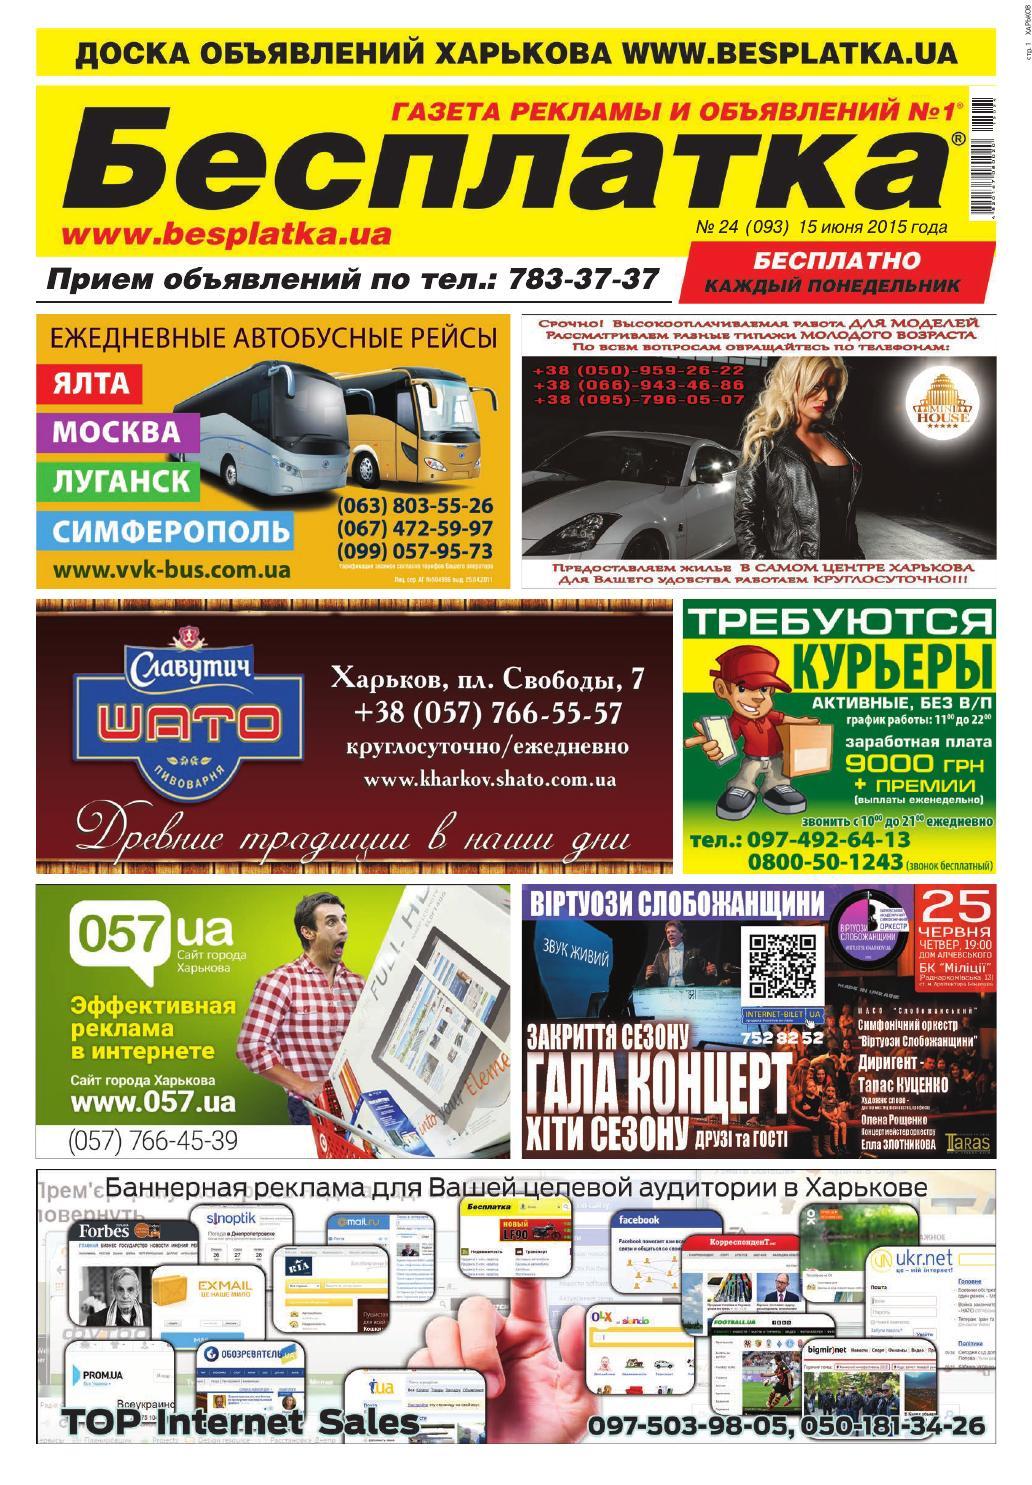 Besplatka Харьков 15.06.2015 by besplatka ukraine - issuu 97b51d45a8360